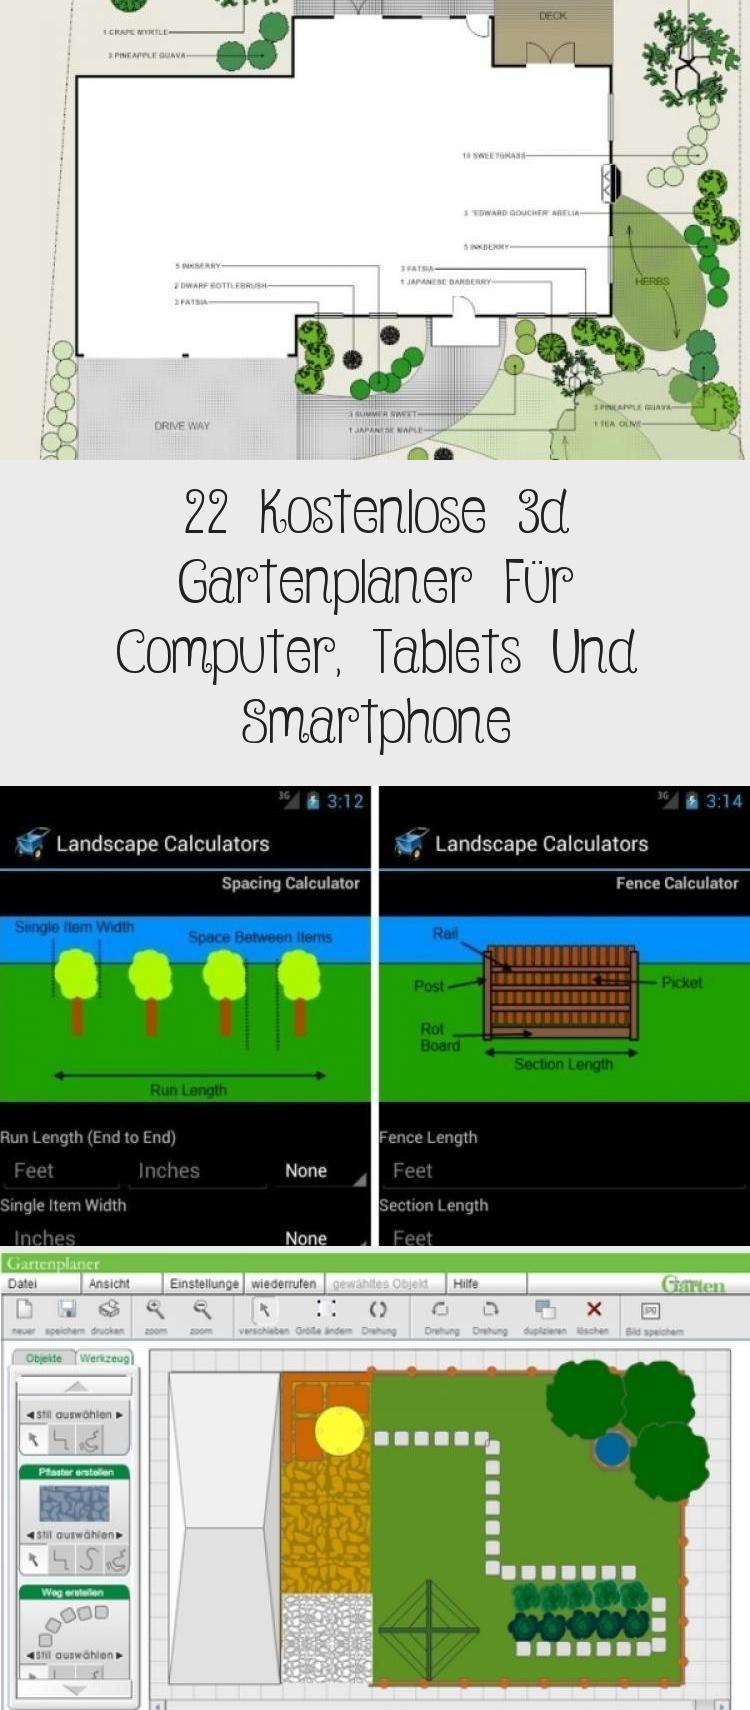 Planer Landschaftsbau Online Software Mein Schoener Garten Planungstool Gartenplanungideen Gartenplanungkinder Gartenplanung In 2020 Post Board Landscape Smartphone